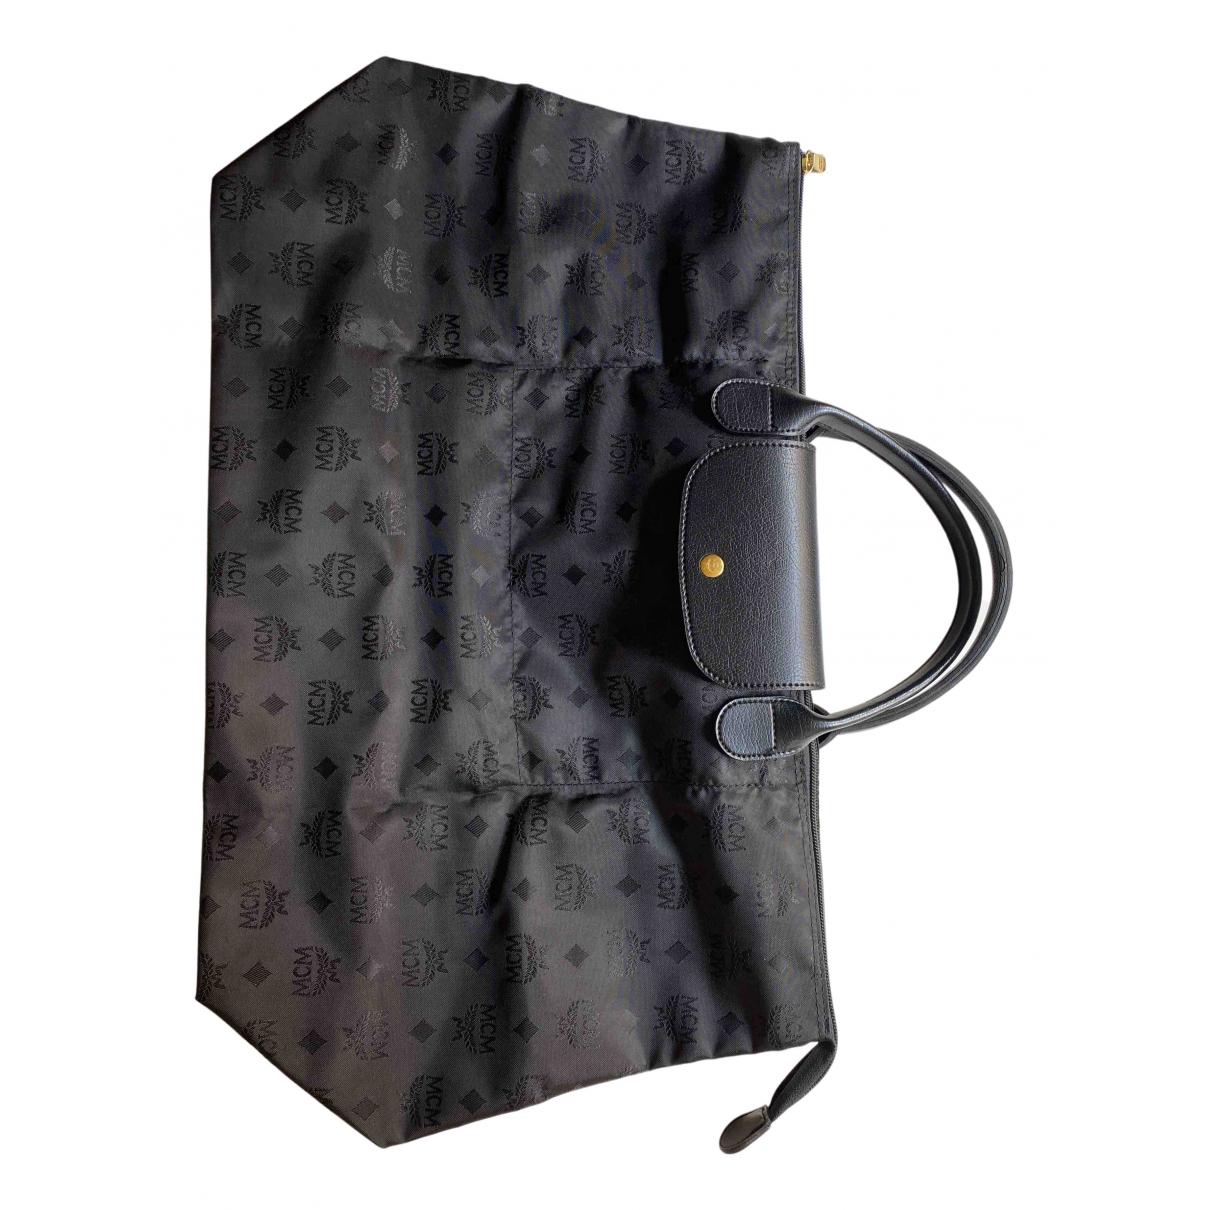 Mcm Anya Black Travel bag for Women N